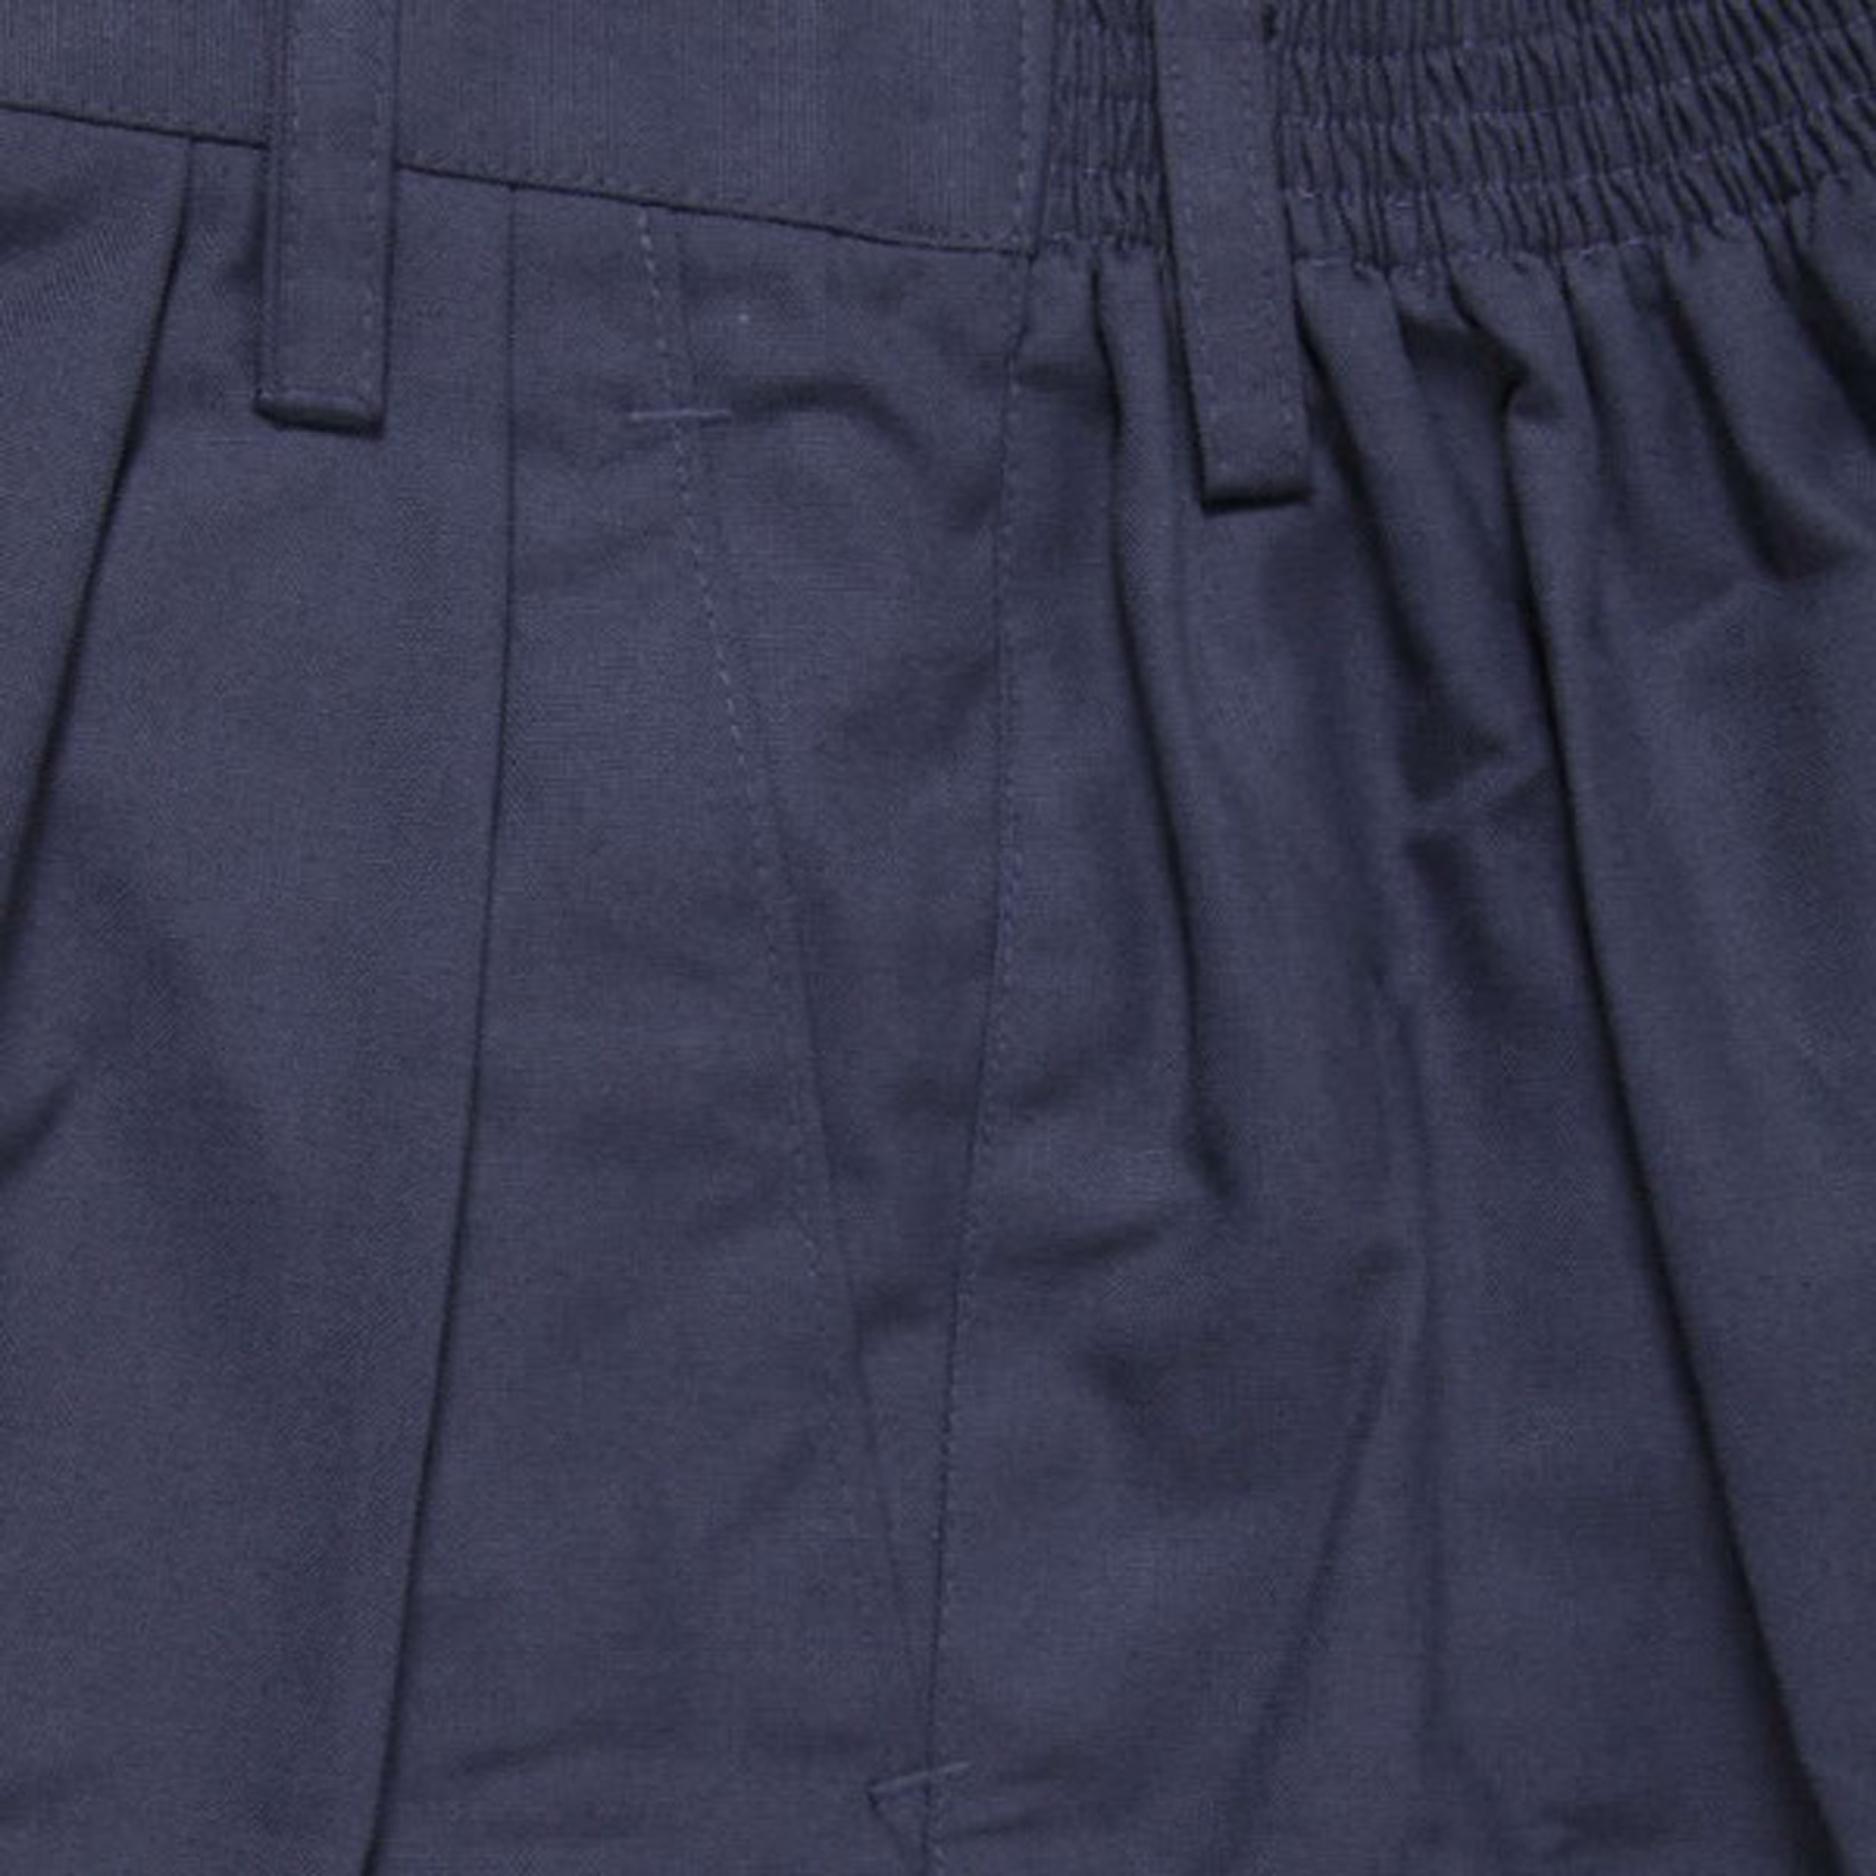 School Uniform Pants